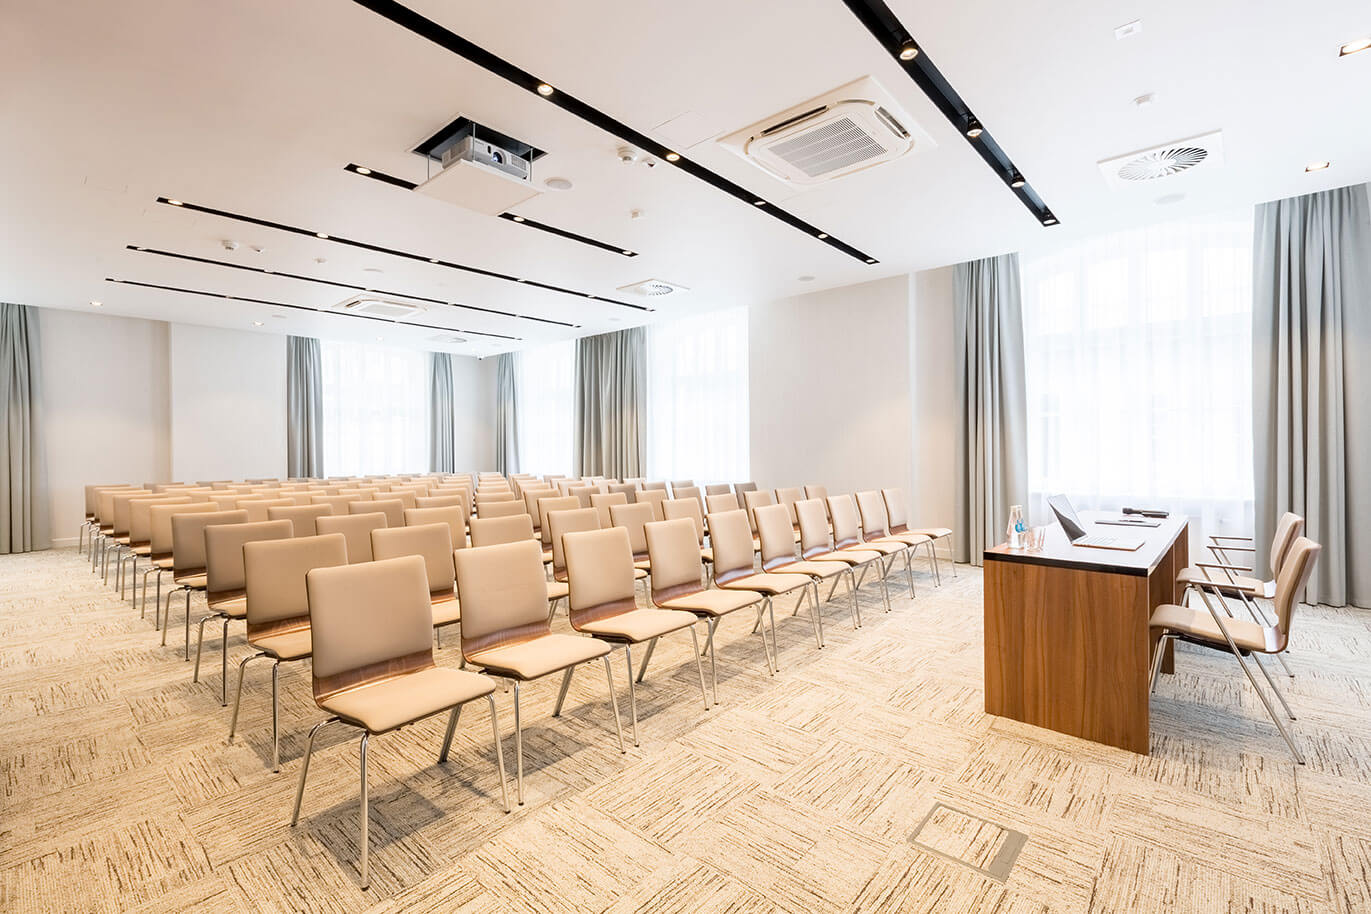 Konferenzraum im Grand Ascot Hotel in Krakau